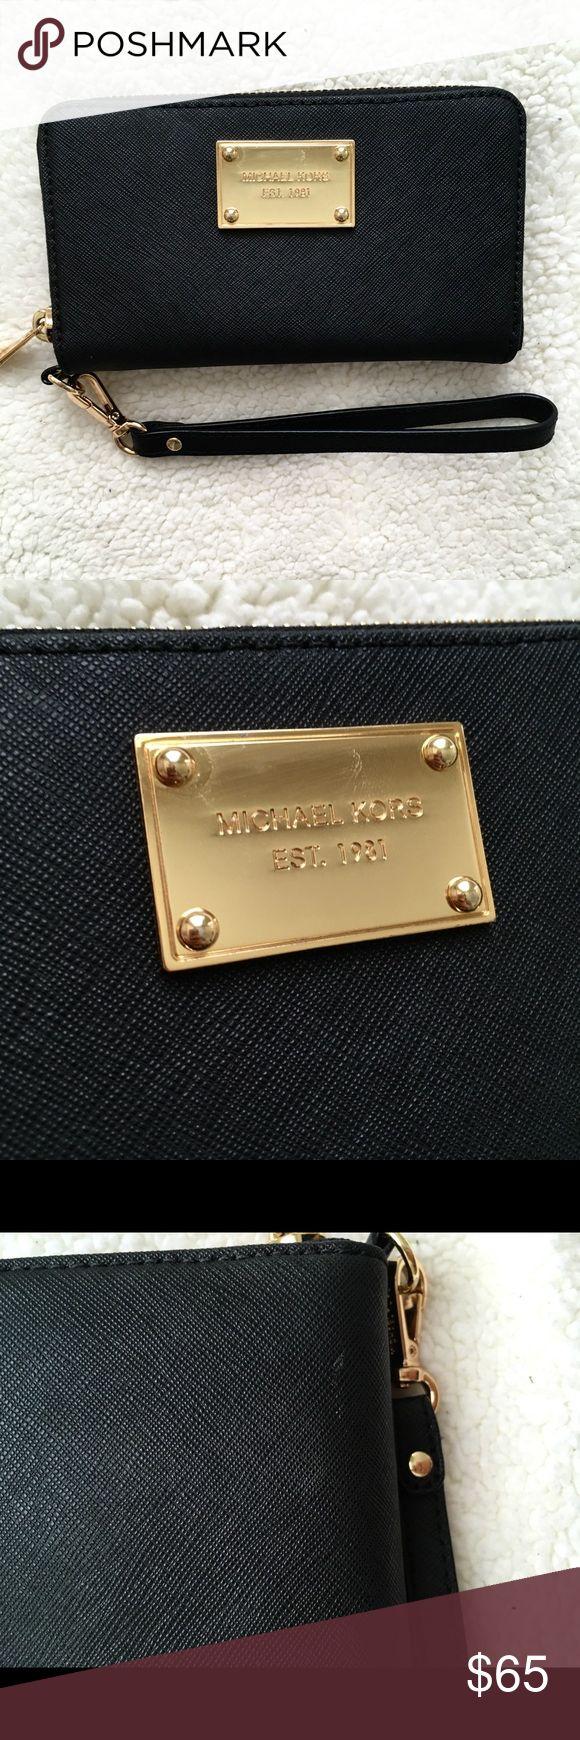 Michael Kors Wristlet Classic wristlet. Minor signs of wear. Beautiful! Michael Kors Bags Clutches & Wristlets